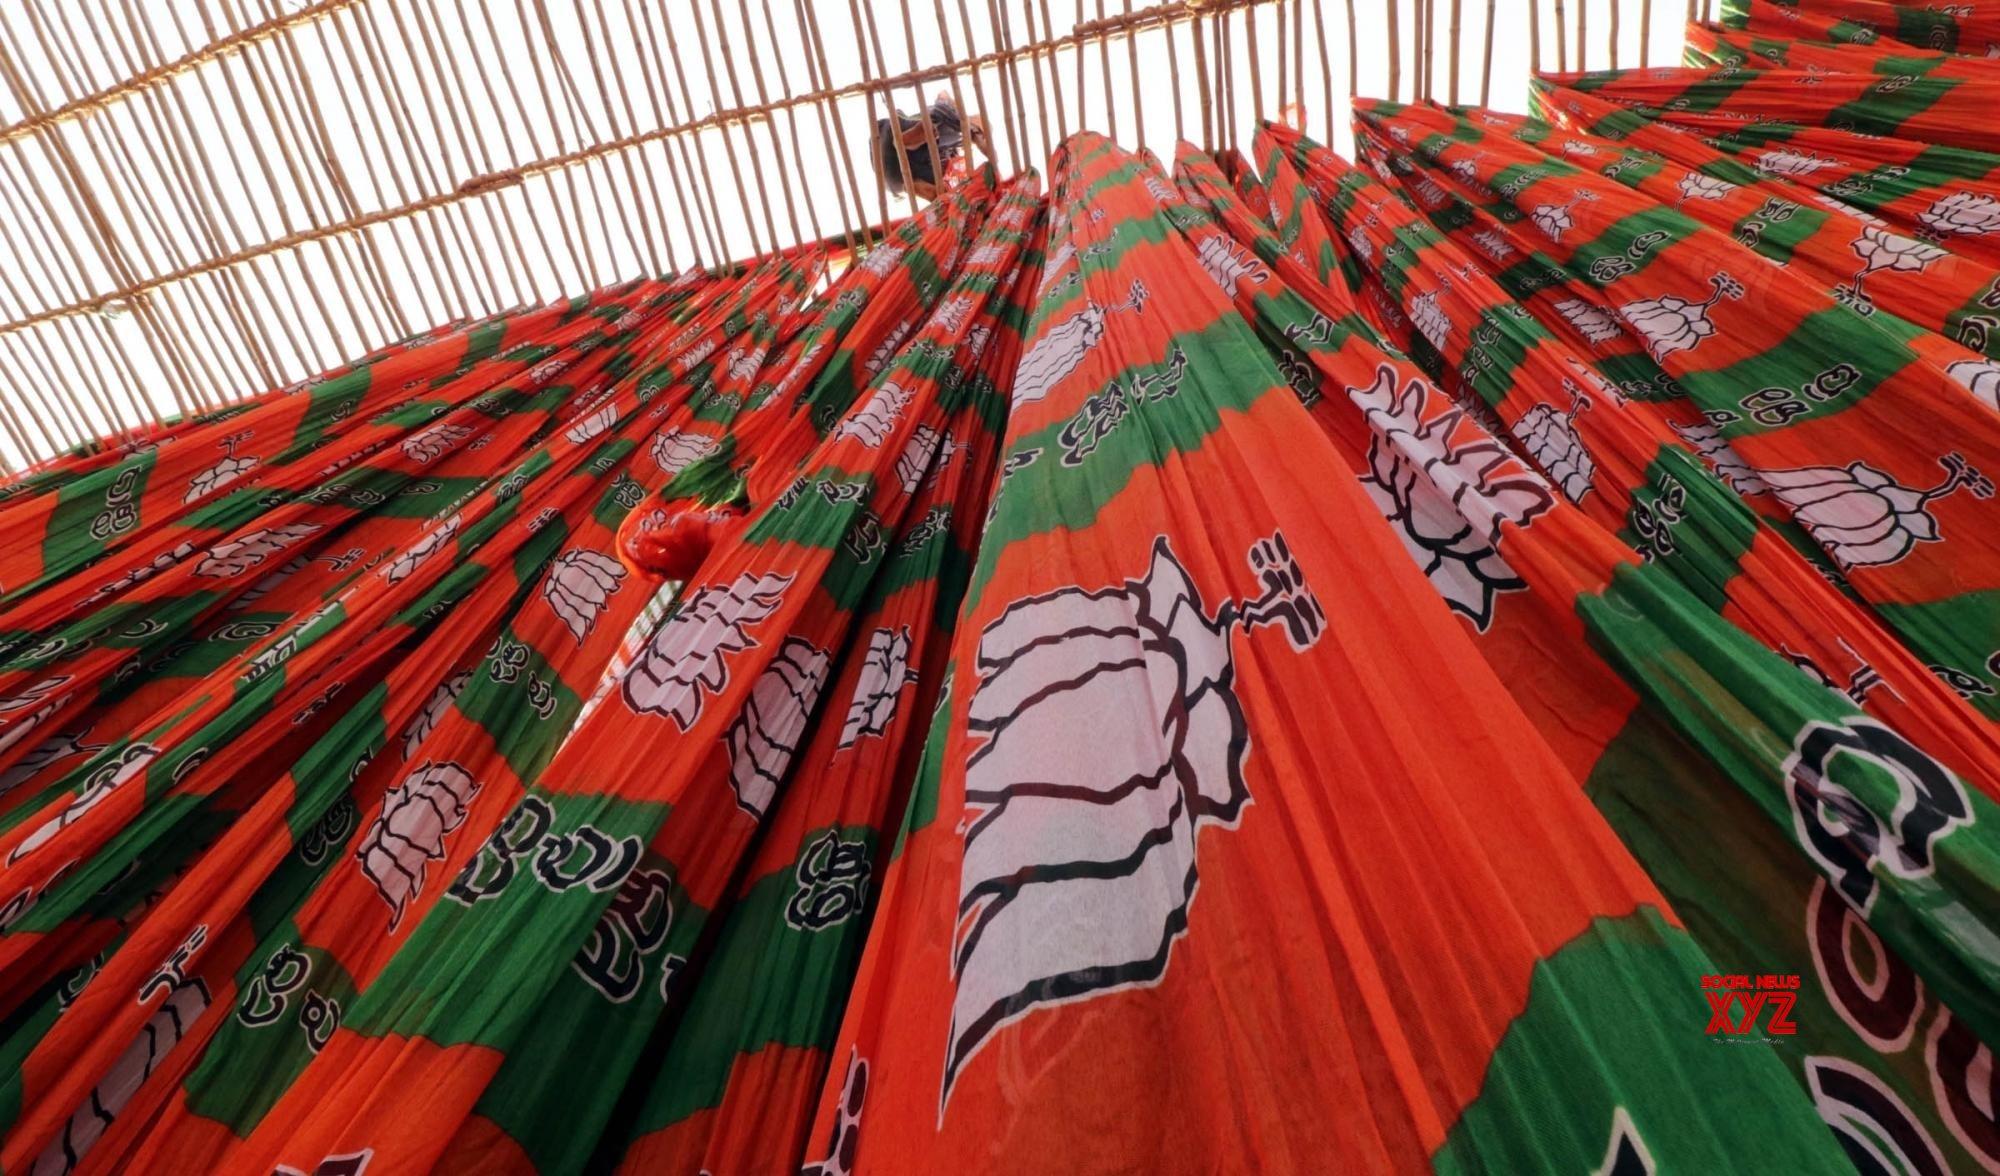 Despite panchayat losses, mood in UP BJP upbeat